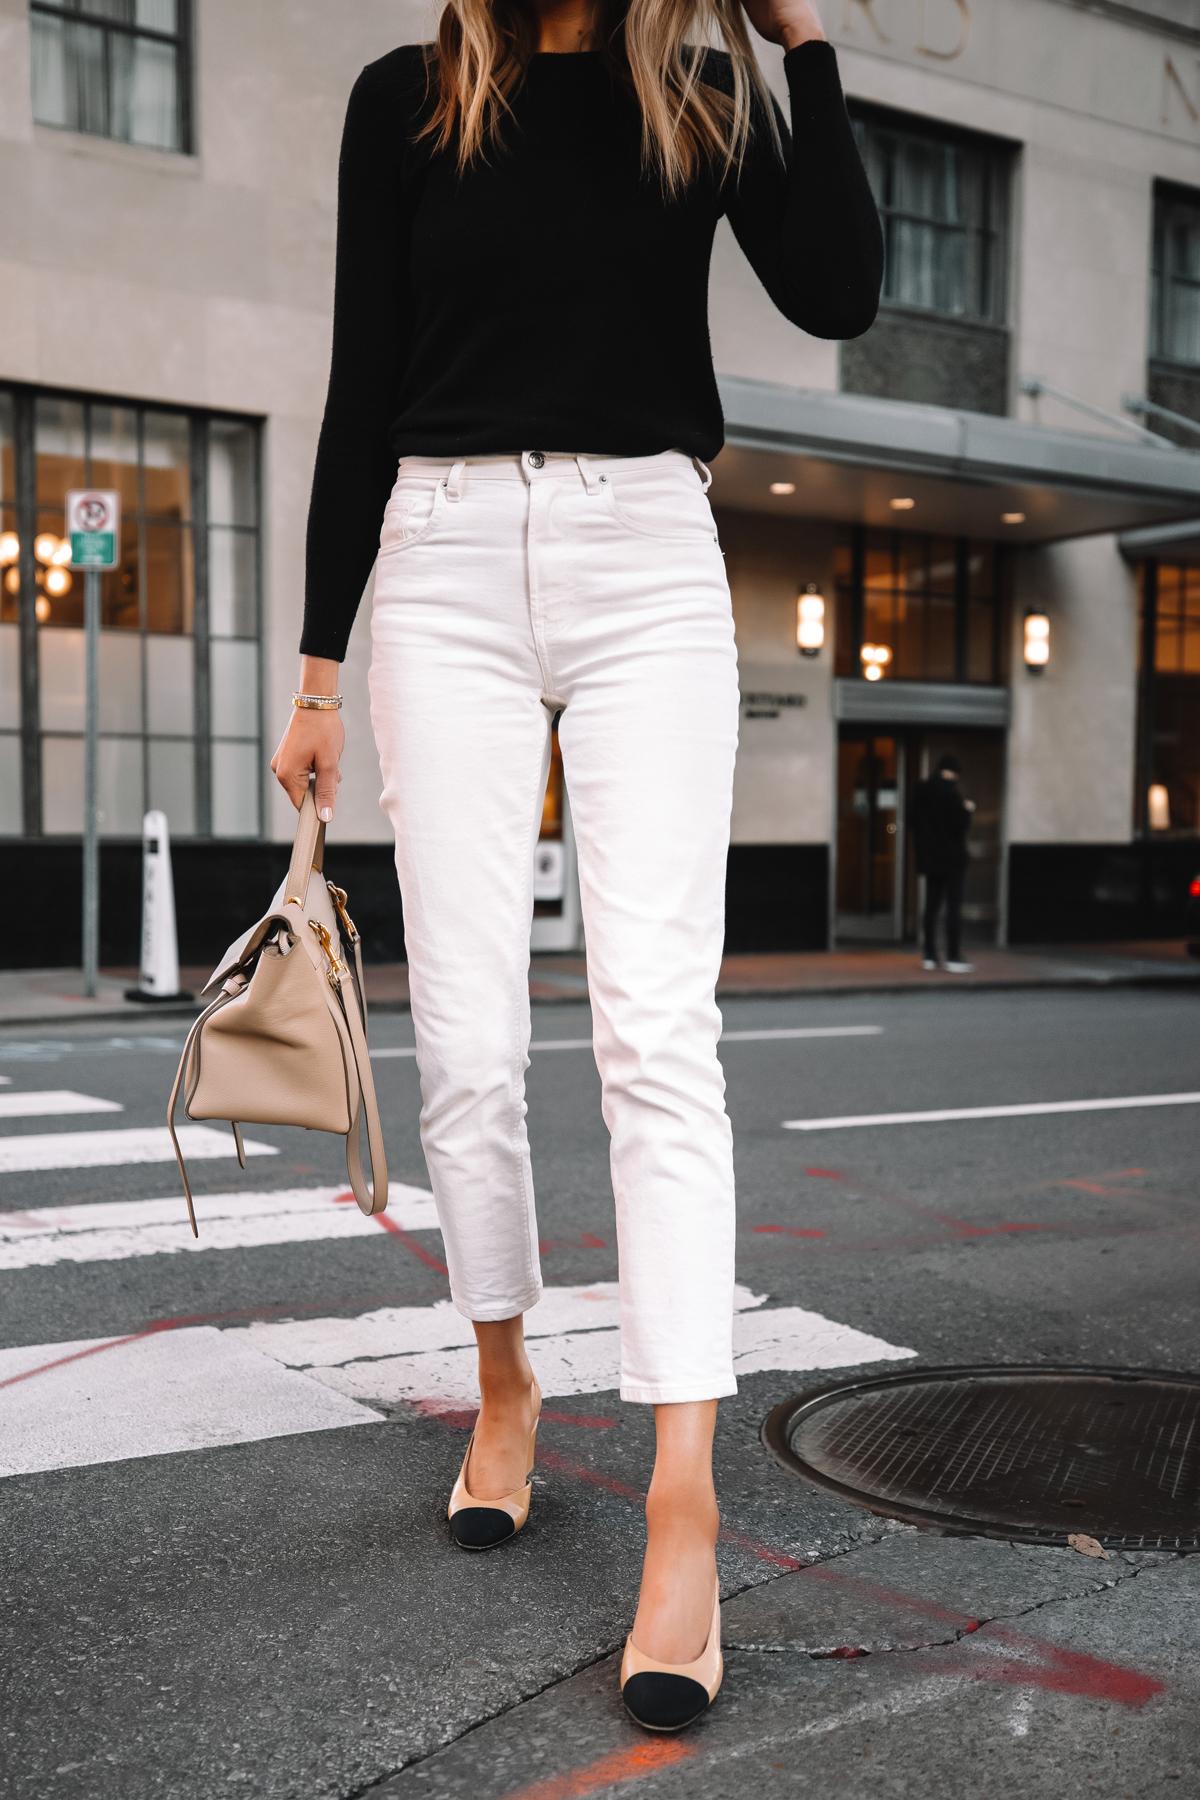 Fashion Jackson Wearing Everlane Black Cashmere Sweater Everlane White Jeans Chanel Slingbacks Celine Belt Bag